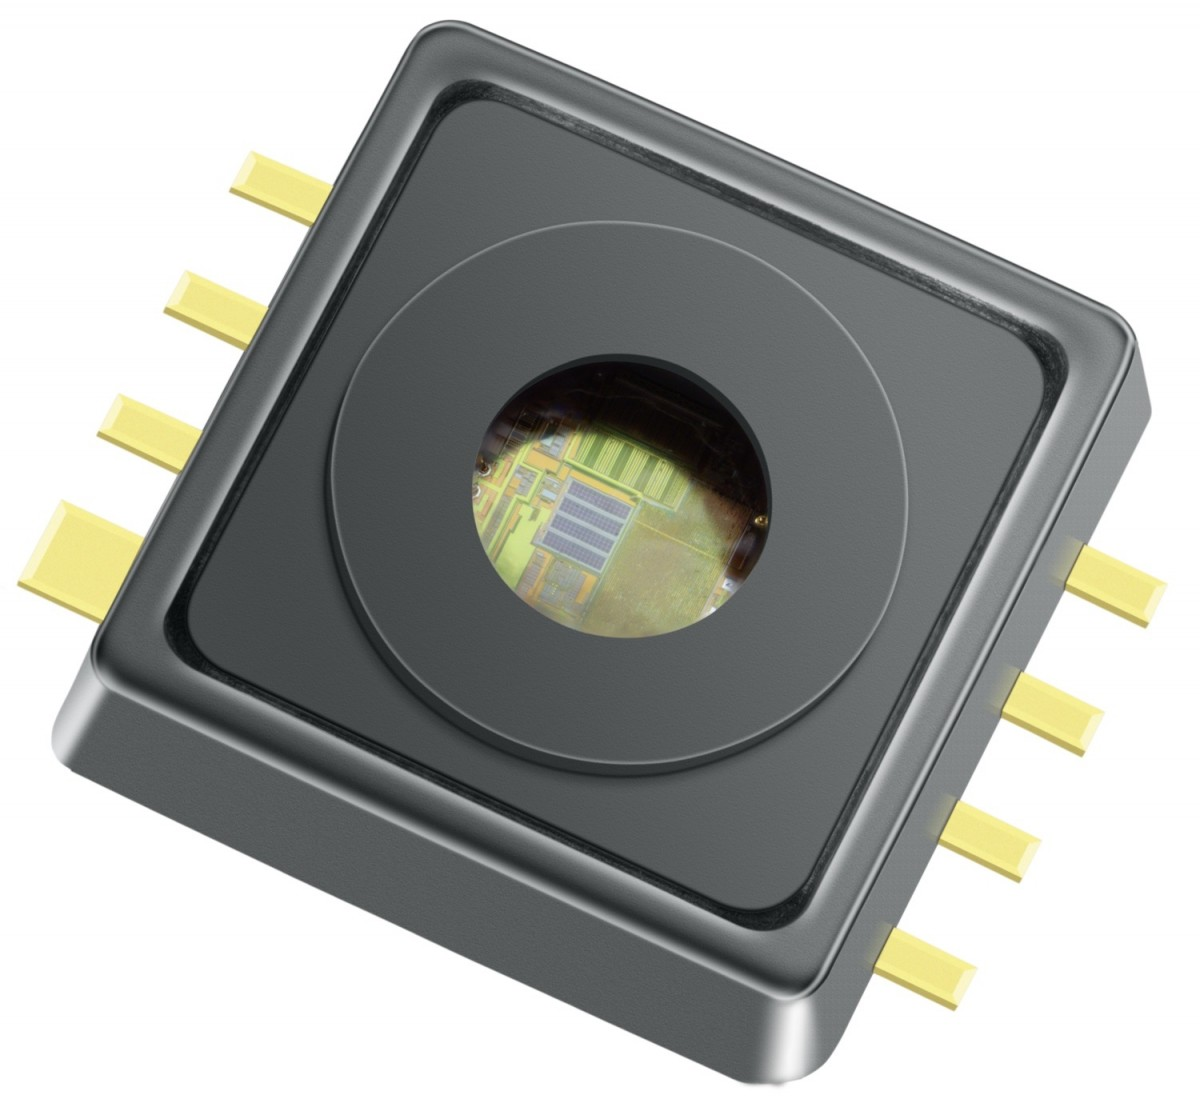 Infineon_XENSIV_KP276.jpg